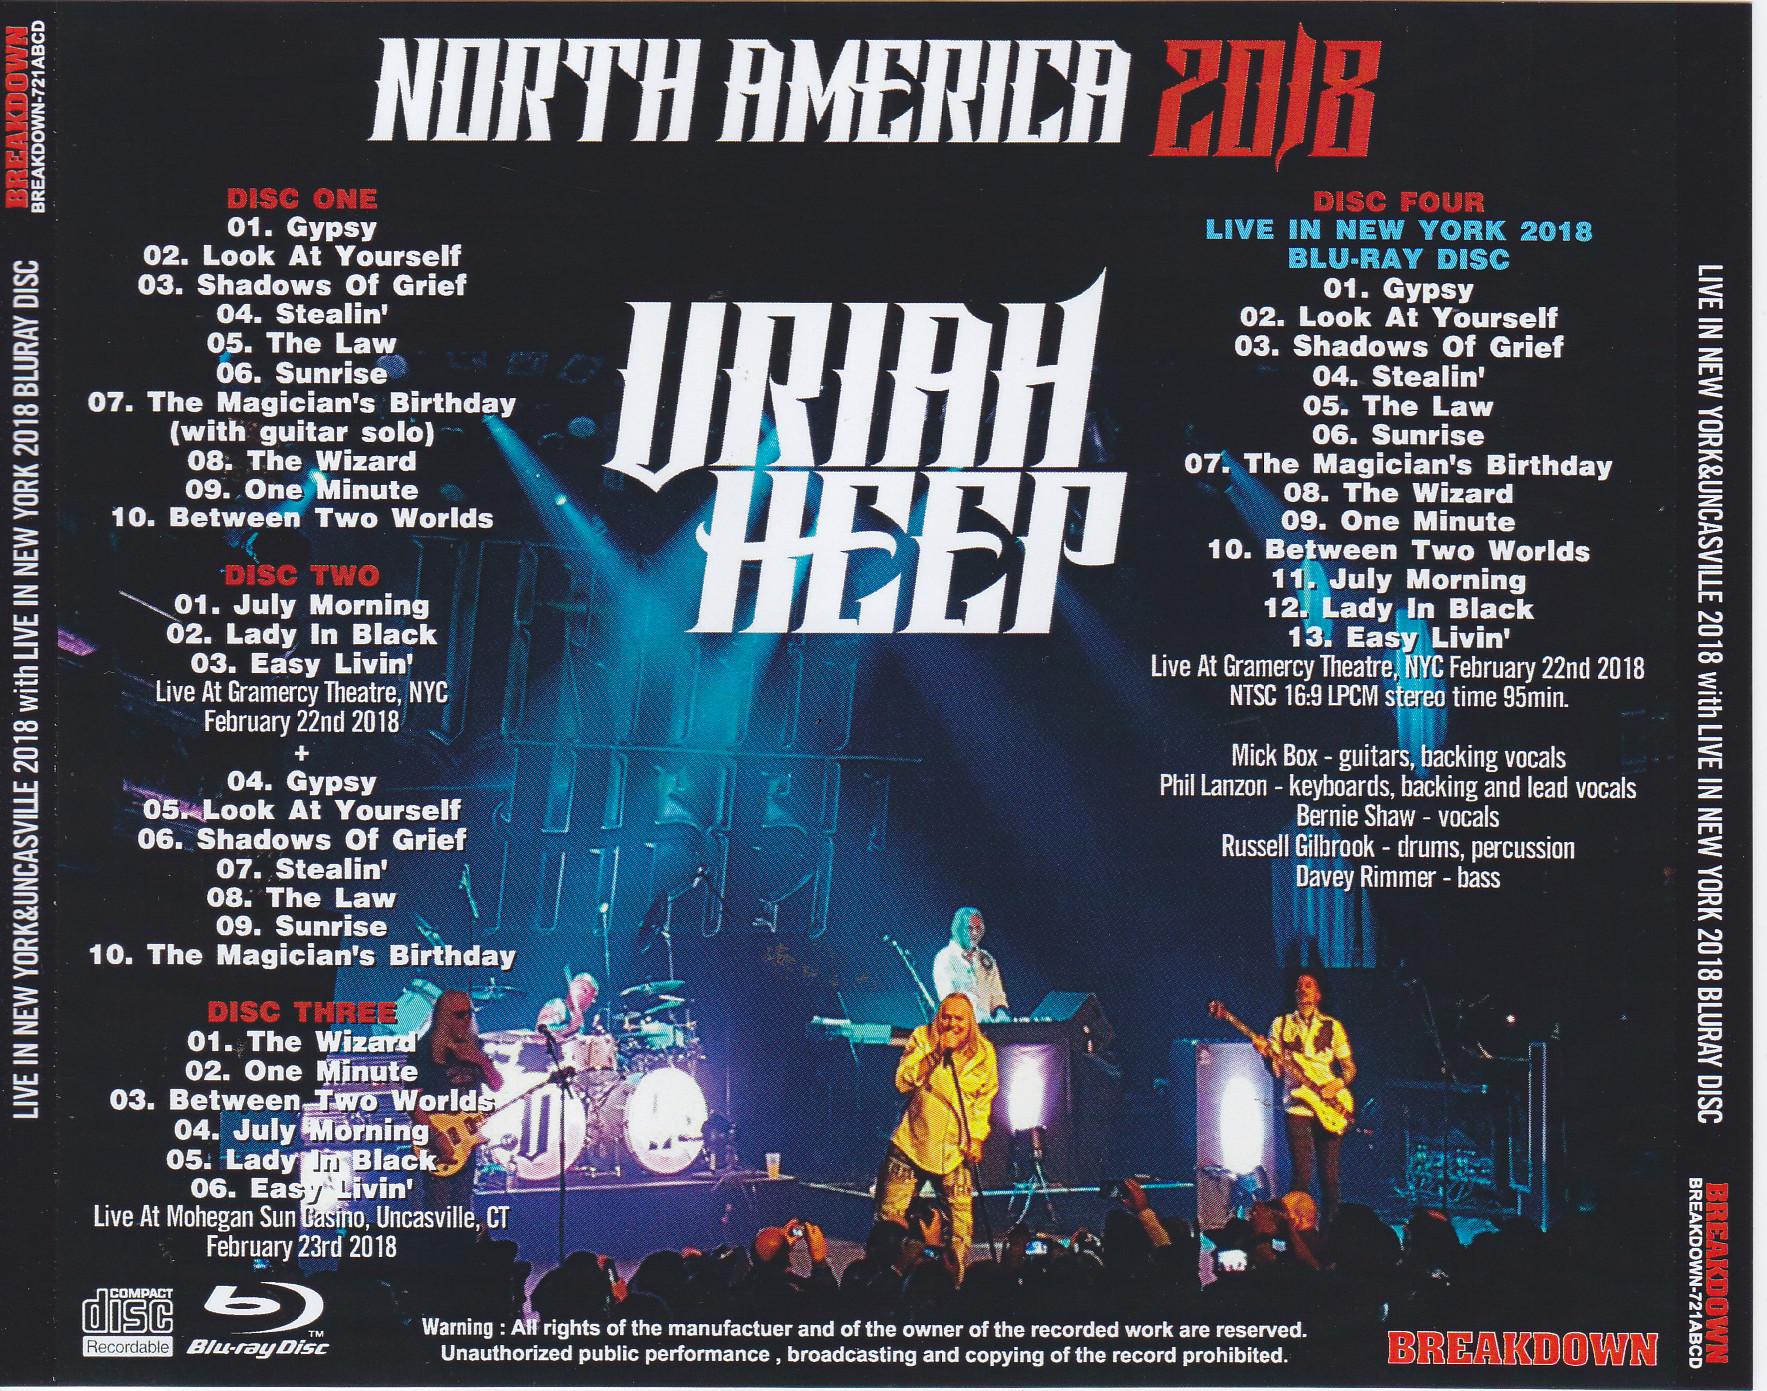 Uriah Heep North America 2018 3pro Cdr 1blu Ray R Breakdown 721a B C D Discjapan